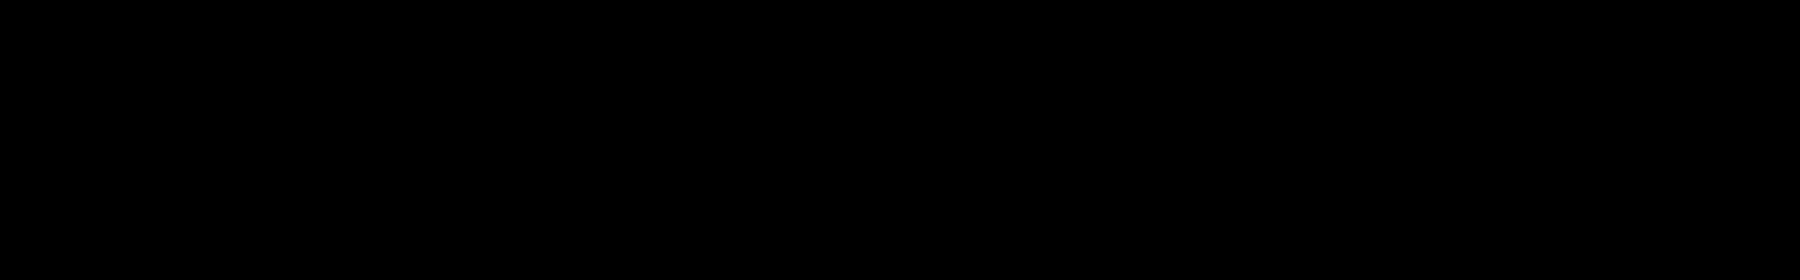 Bass Loops audio waveform